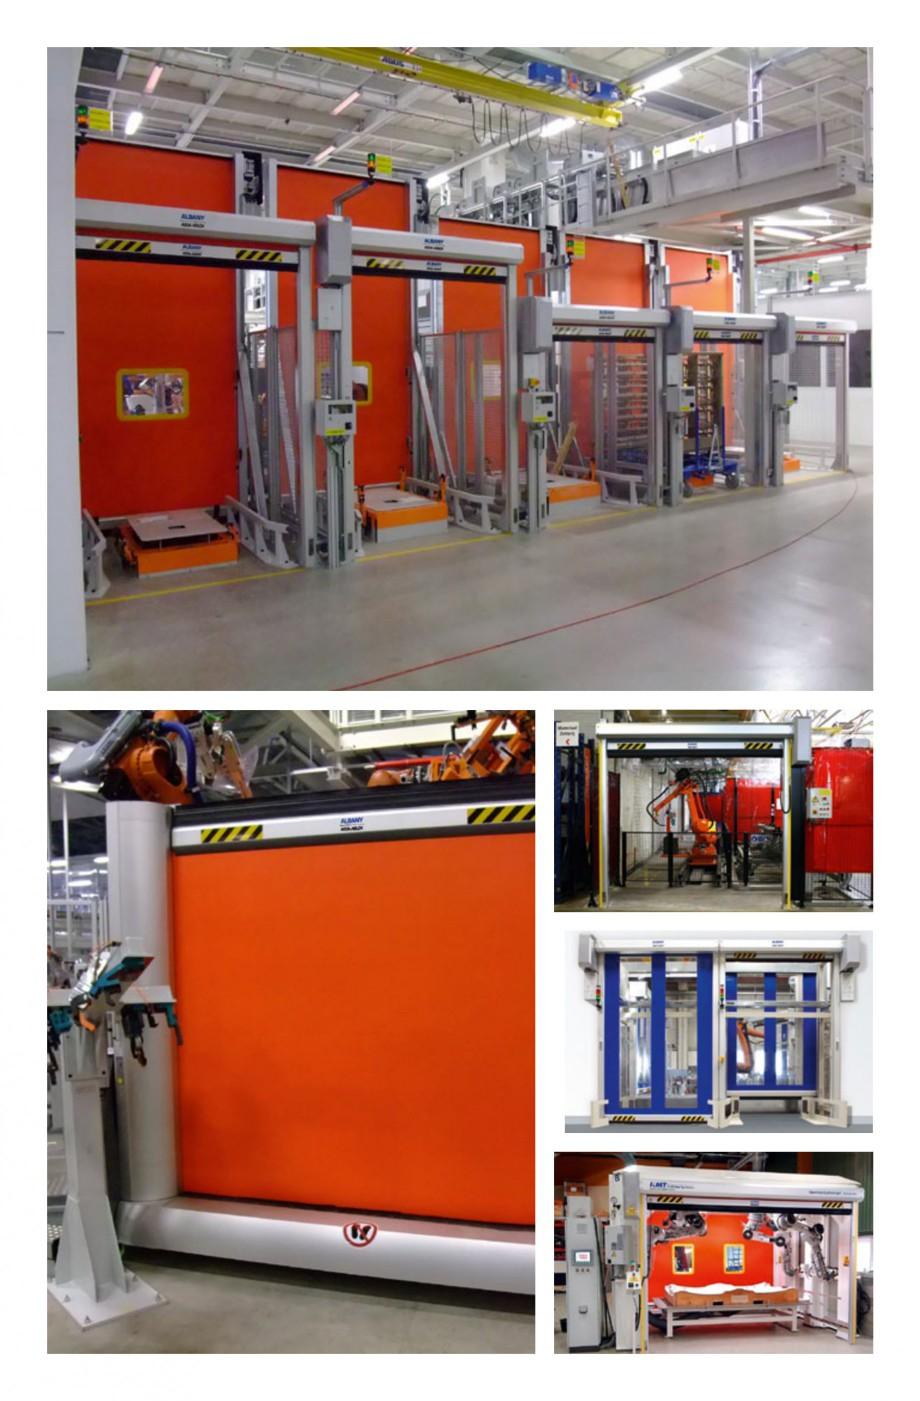 Pagina 5 - Usi industriale de inalta performata ASSA ABLOY RapidProtectTM 100, RapidProtectTM 300,...